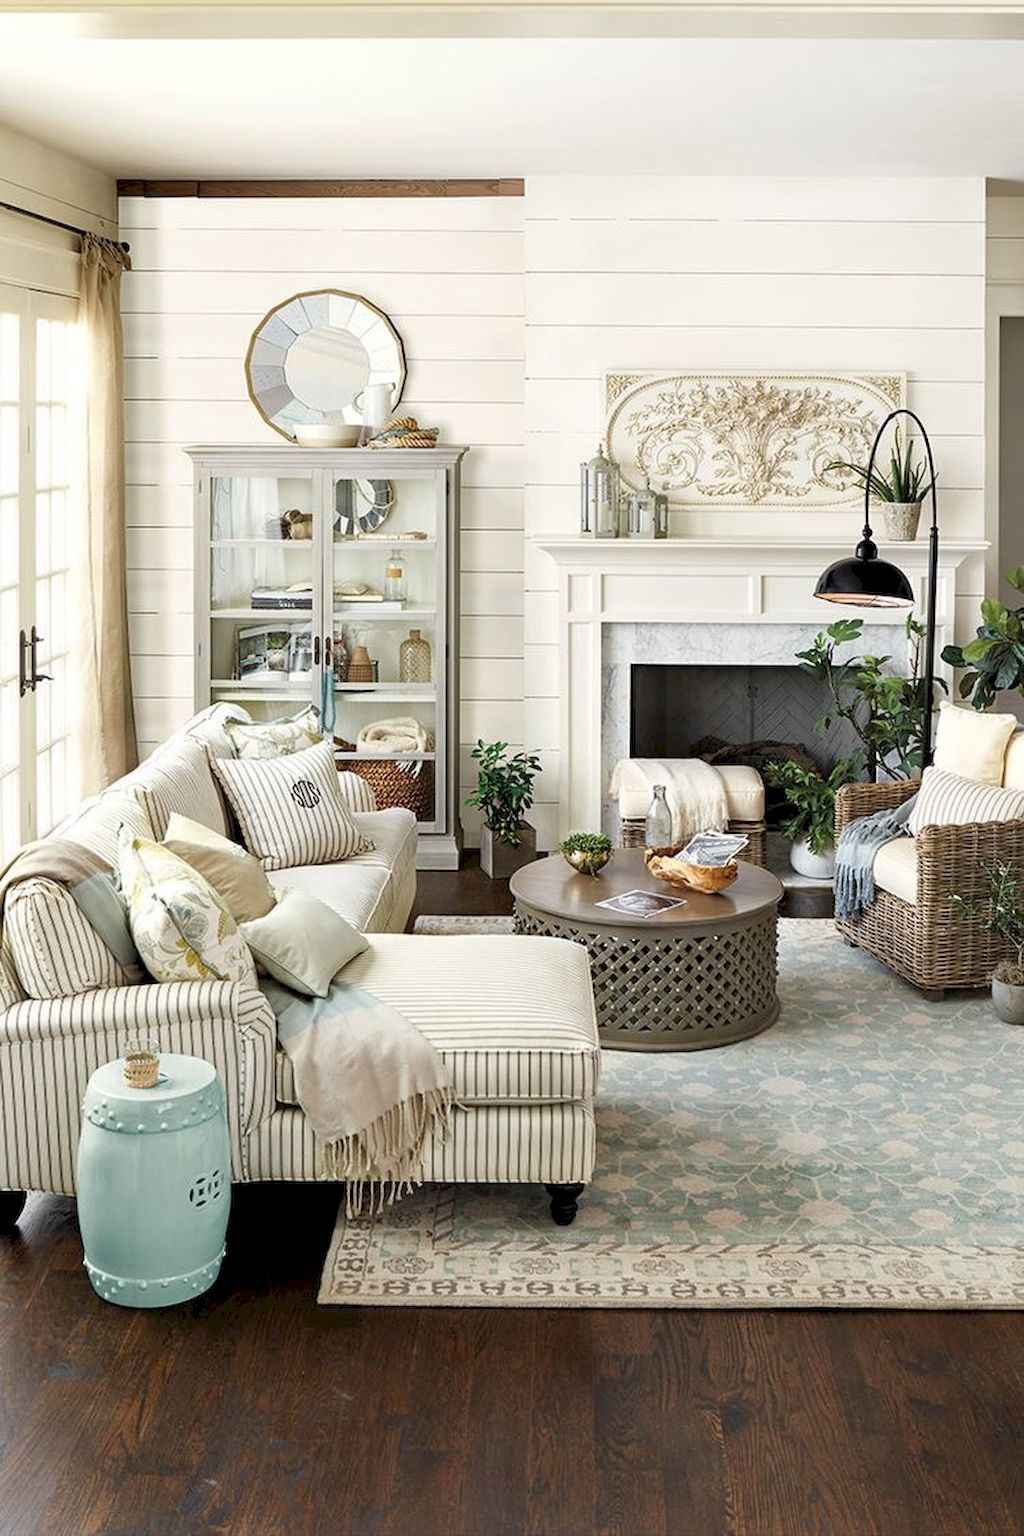 Simple clean vintage living room decorating ideas (17)